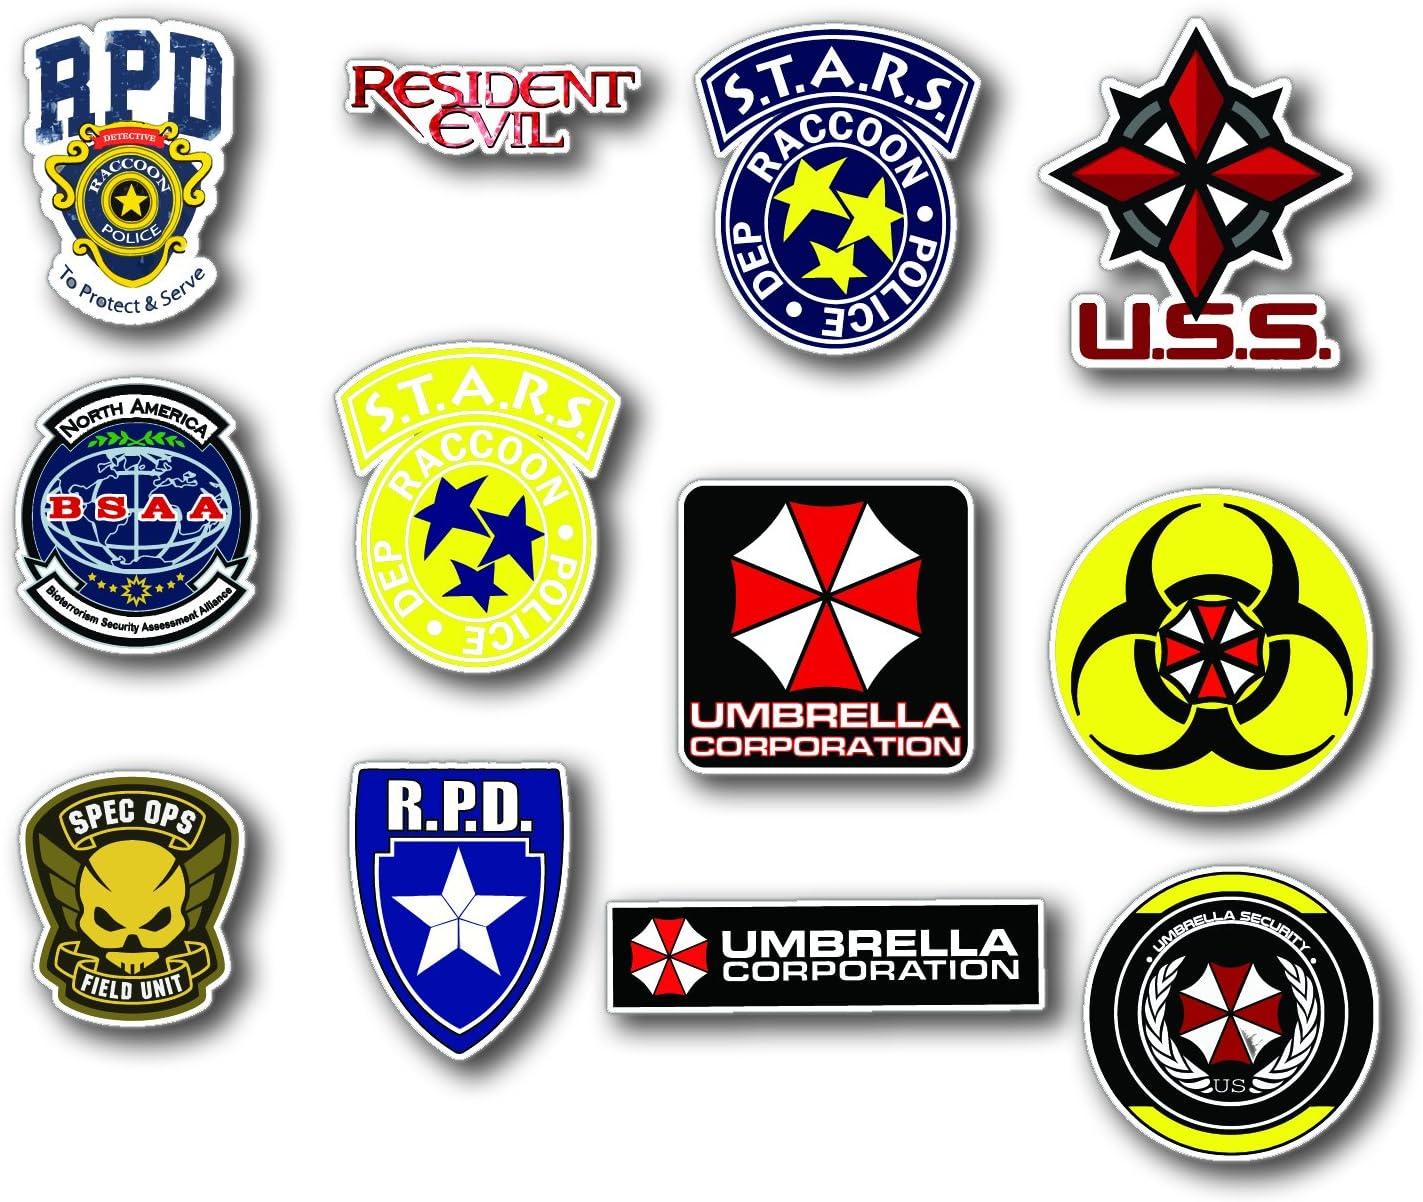 Umbrella Corporation Resident Evil Aufkleber Set Motiv Resident Evil Digitaler Druck 12 Stück Auto